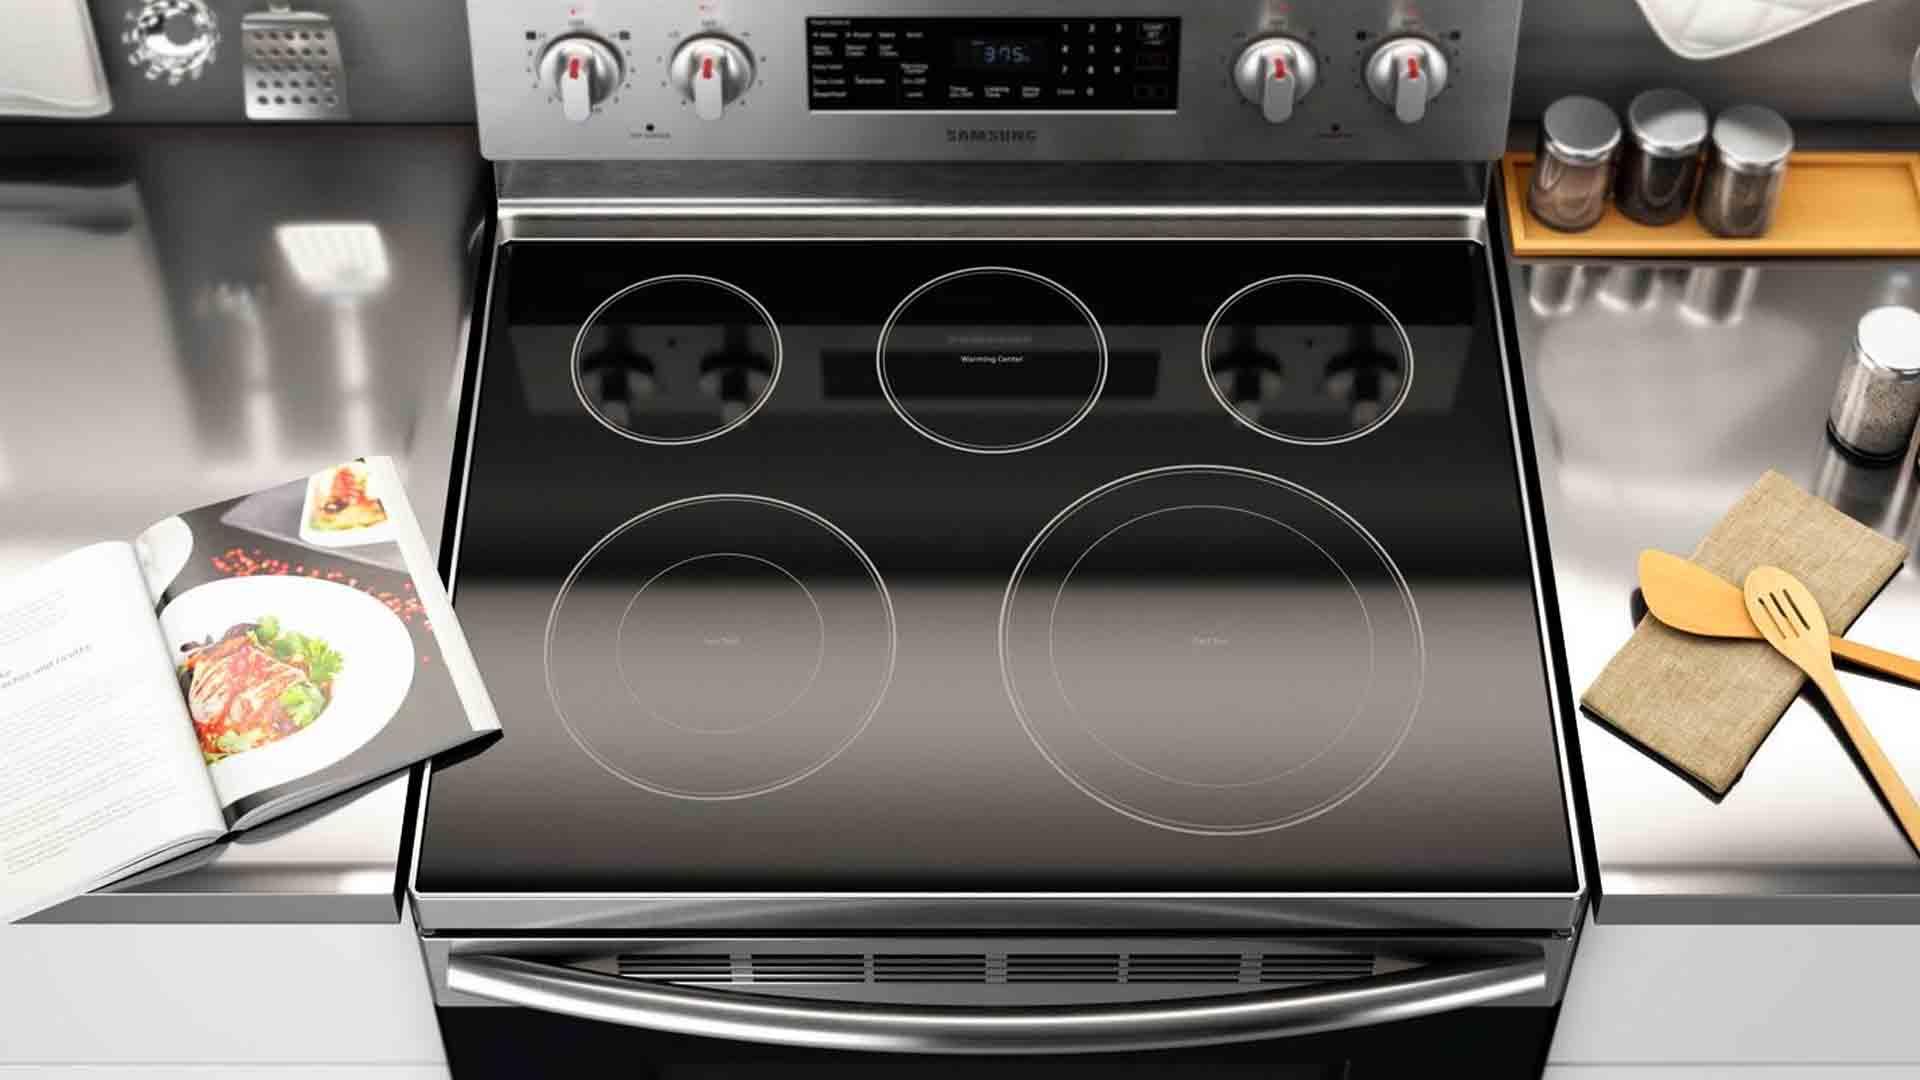 Samsung Electric Range Repair | Samsung Appliance Repairs